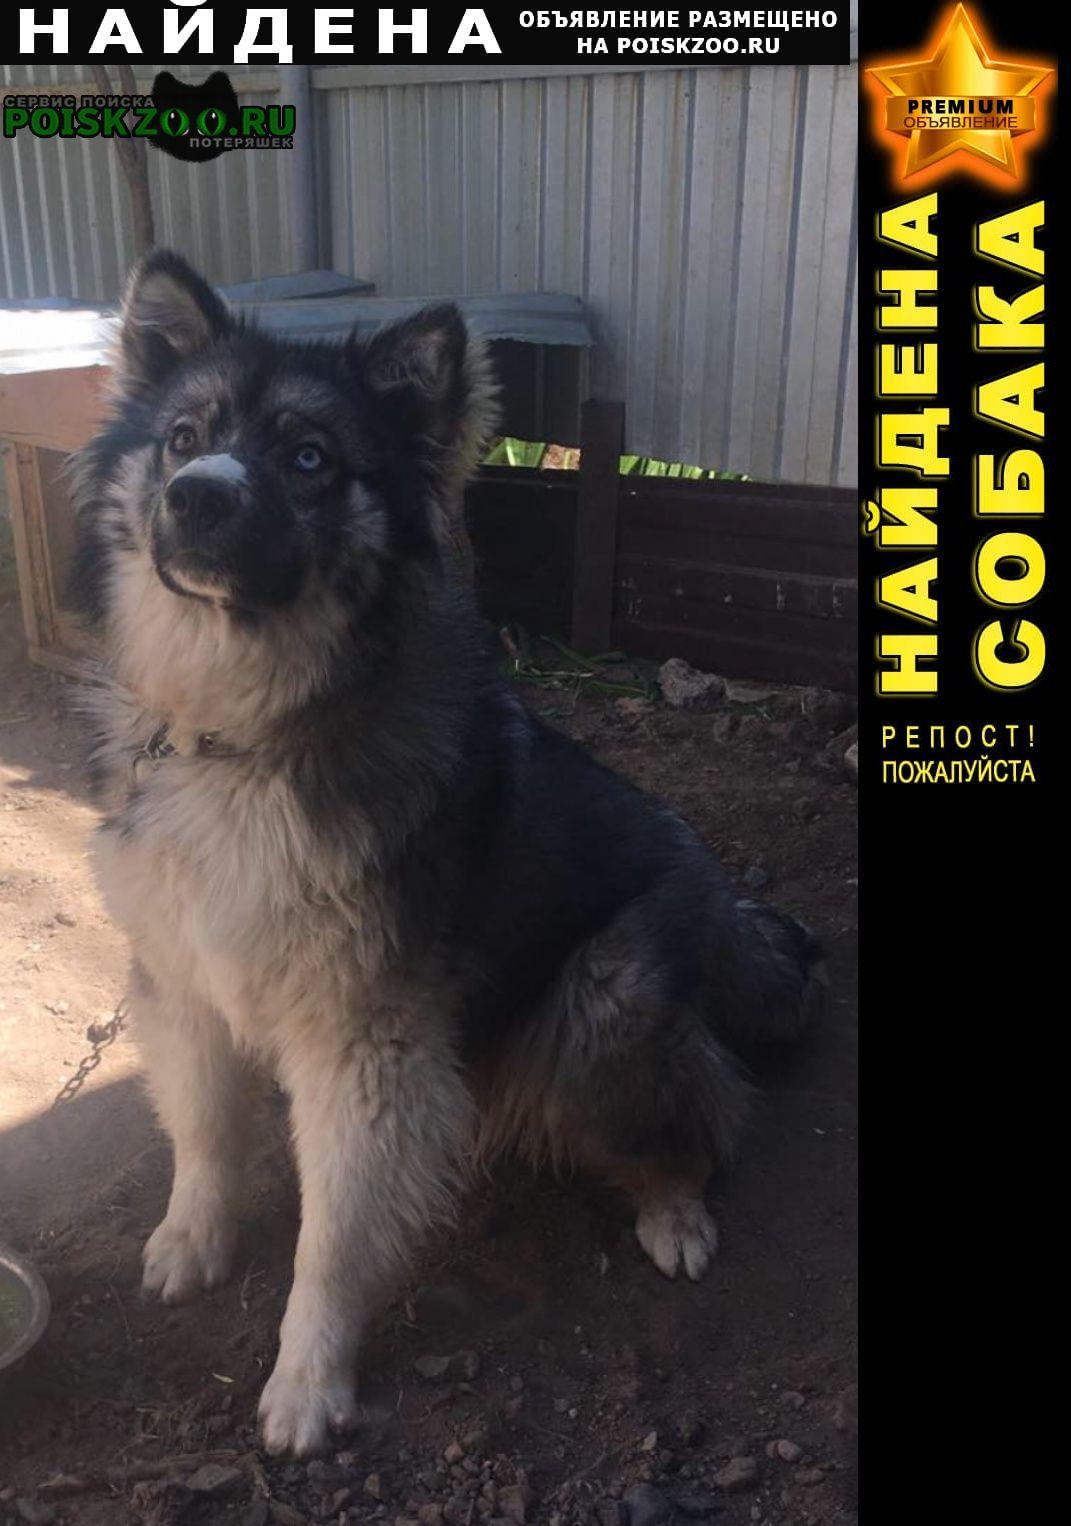 Найдена собака кобель метис хаски глаза разного цвета Оренбург